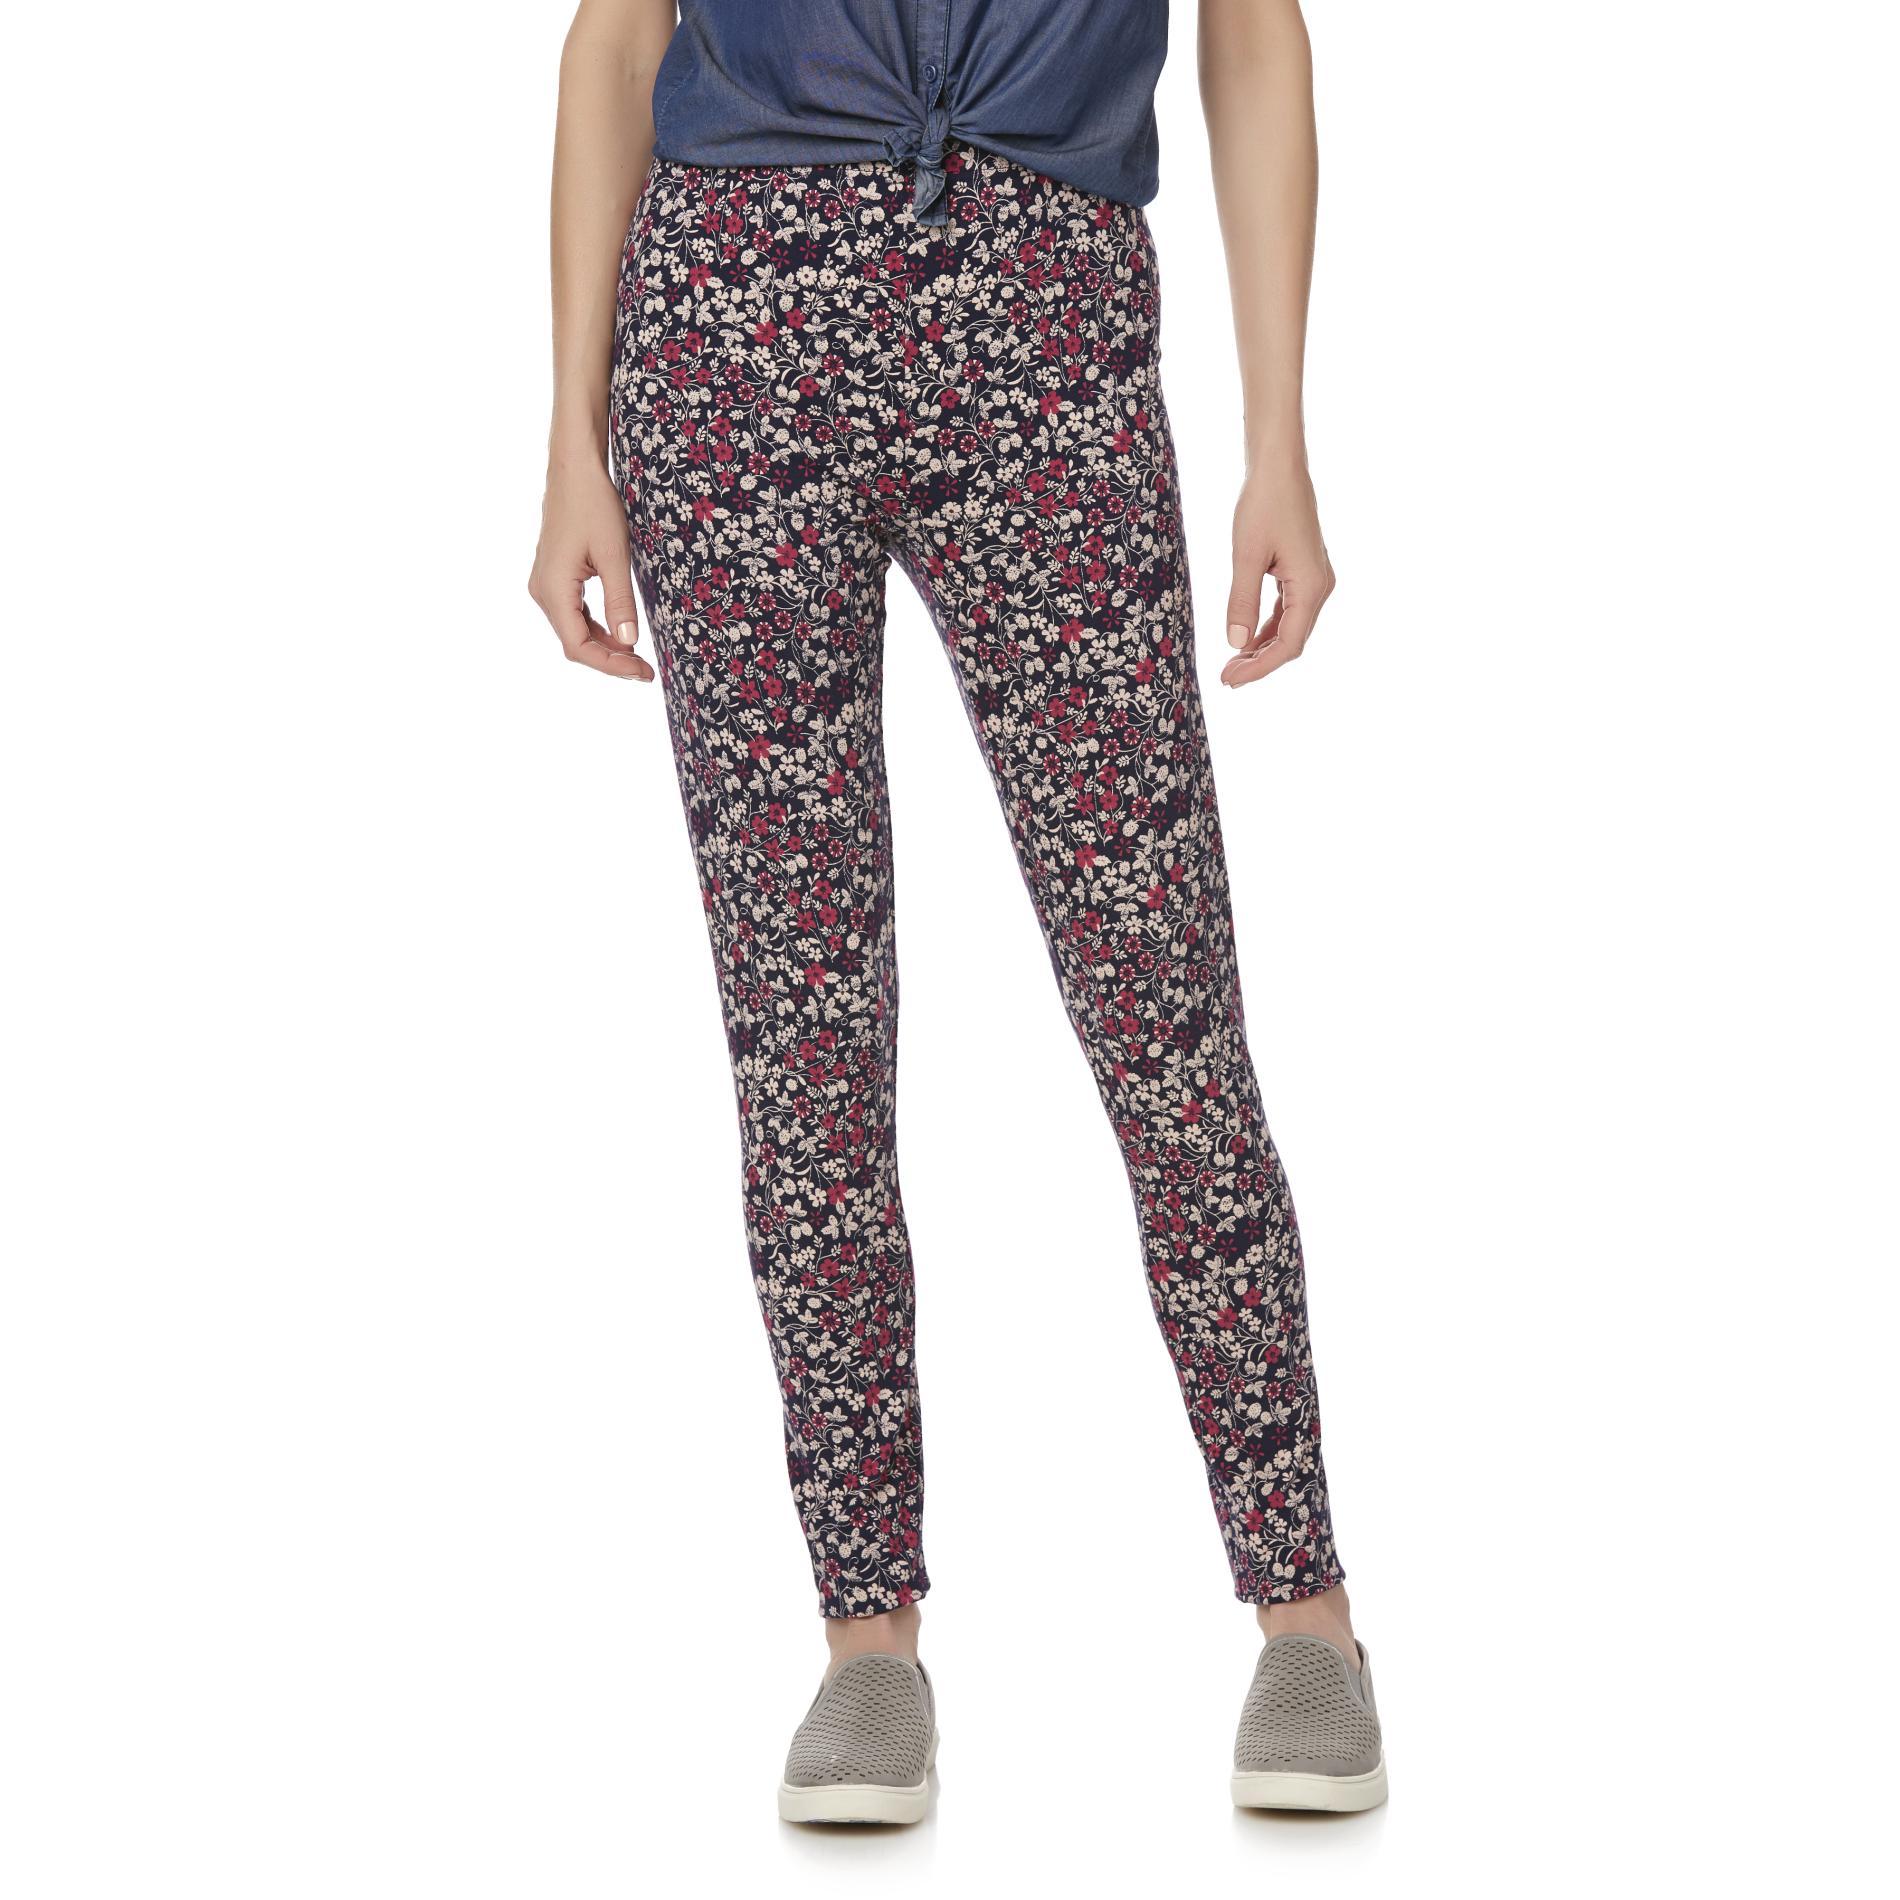 Basic Editions Women' Leggings - Floral